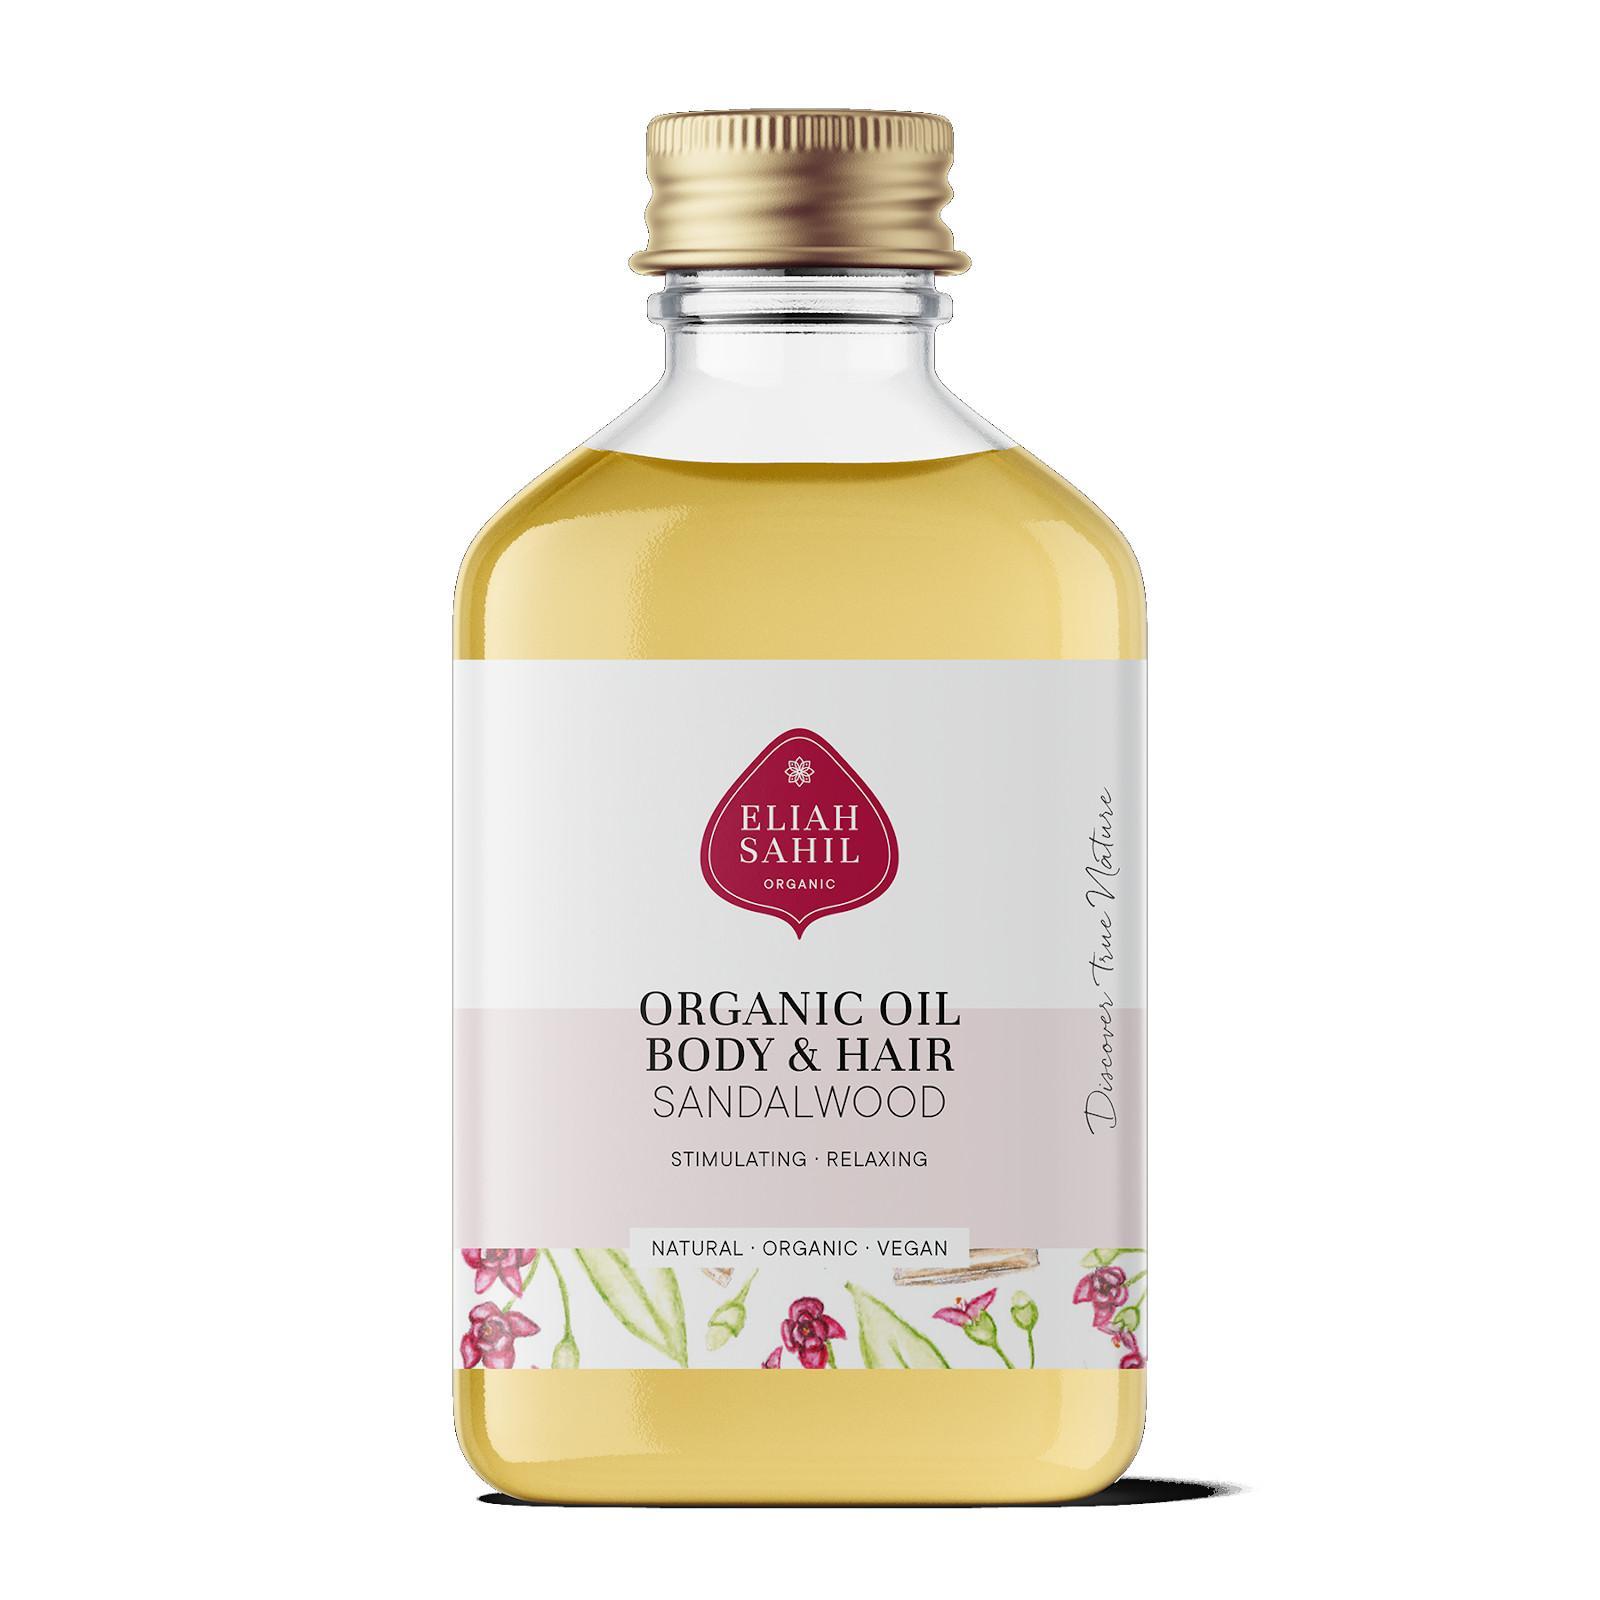 Eliah Sahil Organic Tělový a vlasový olej santalové dřevo 100 ml